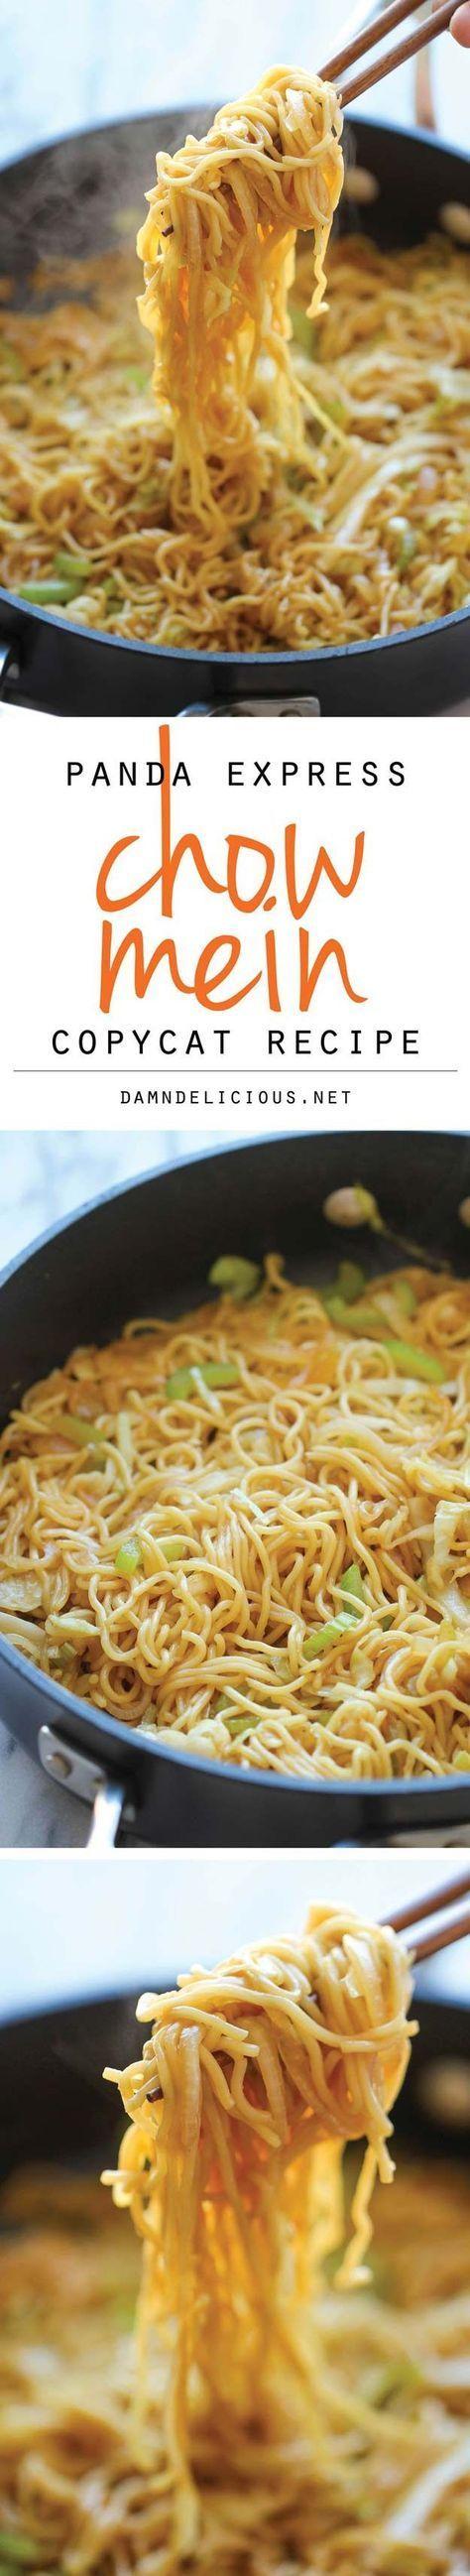 Copycat Recipes From Top Restaurants. Best Recipe Knockoffs from Chipotle, Starbucks, Olive Garden, Cinabbon, Cracker Barrel, Taco Bell, Cheesecake Factory, KFC, Mc Donalds, Red Lobster, Panda Express | Panda Express Chow Mein Copycat | http://diyjoy.com/copycat-recipes